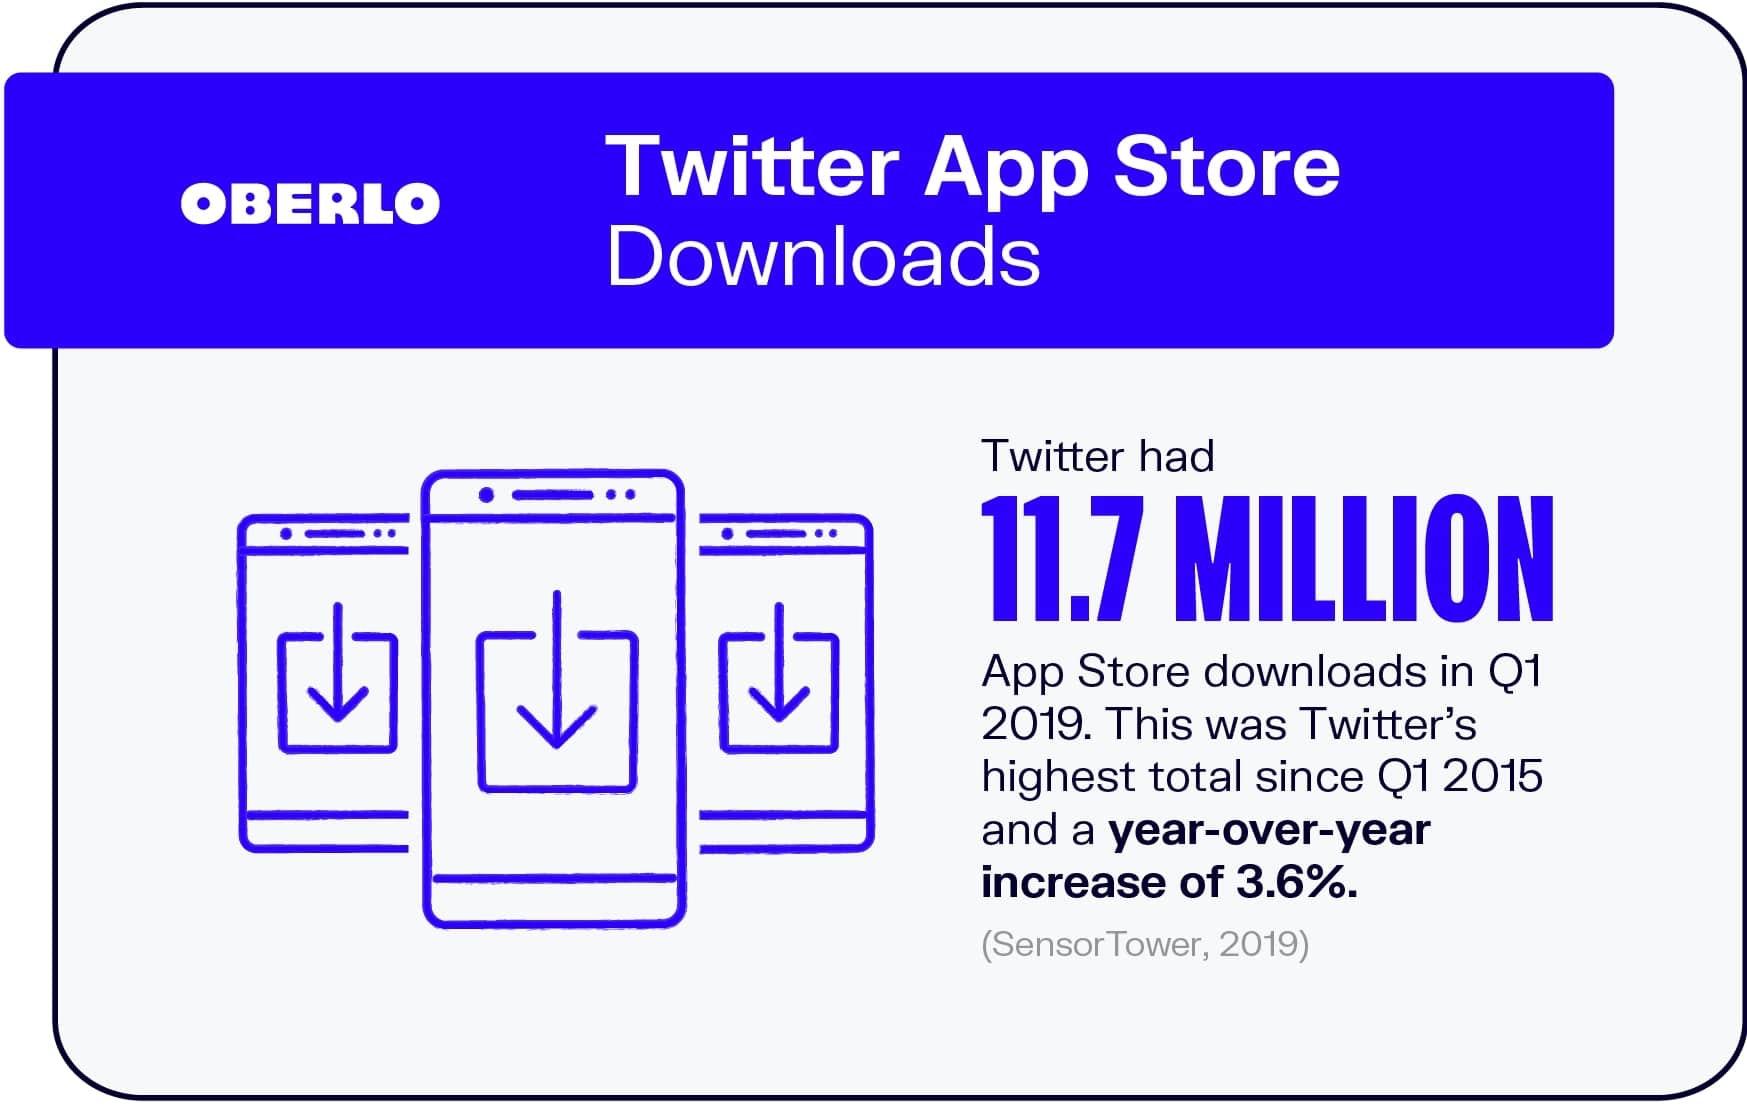 Twitter App Store Downloads